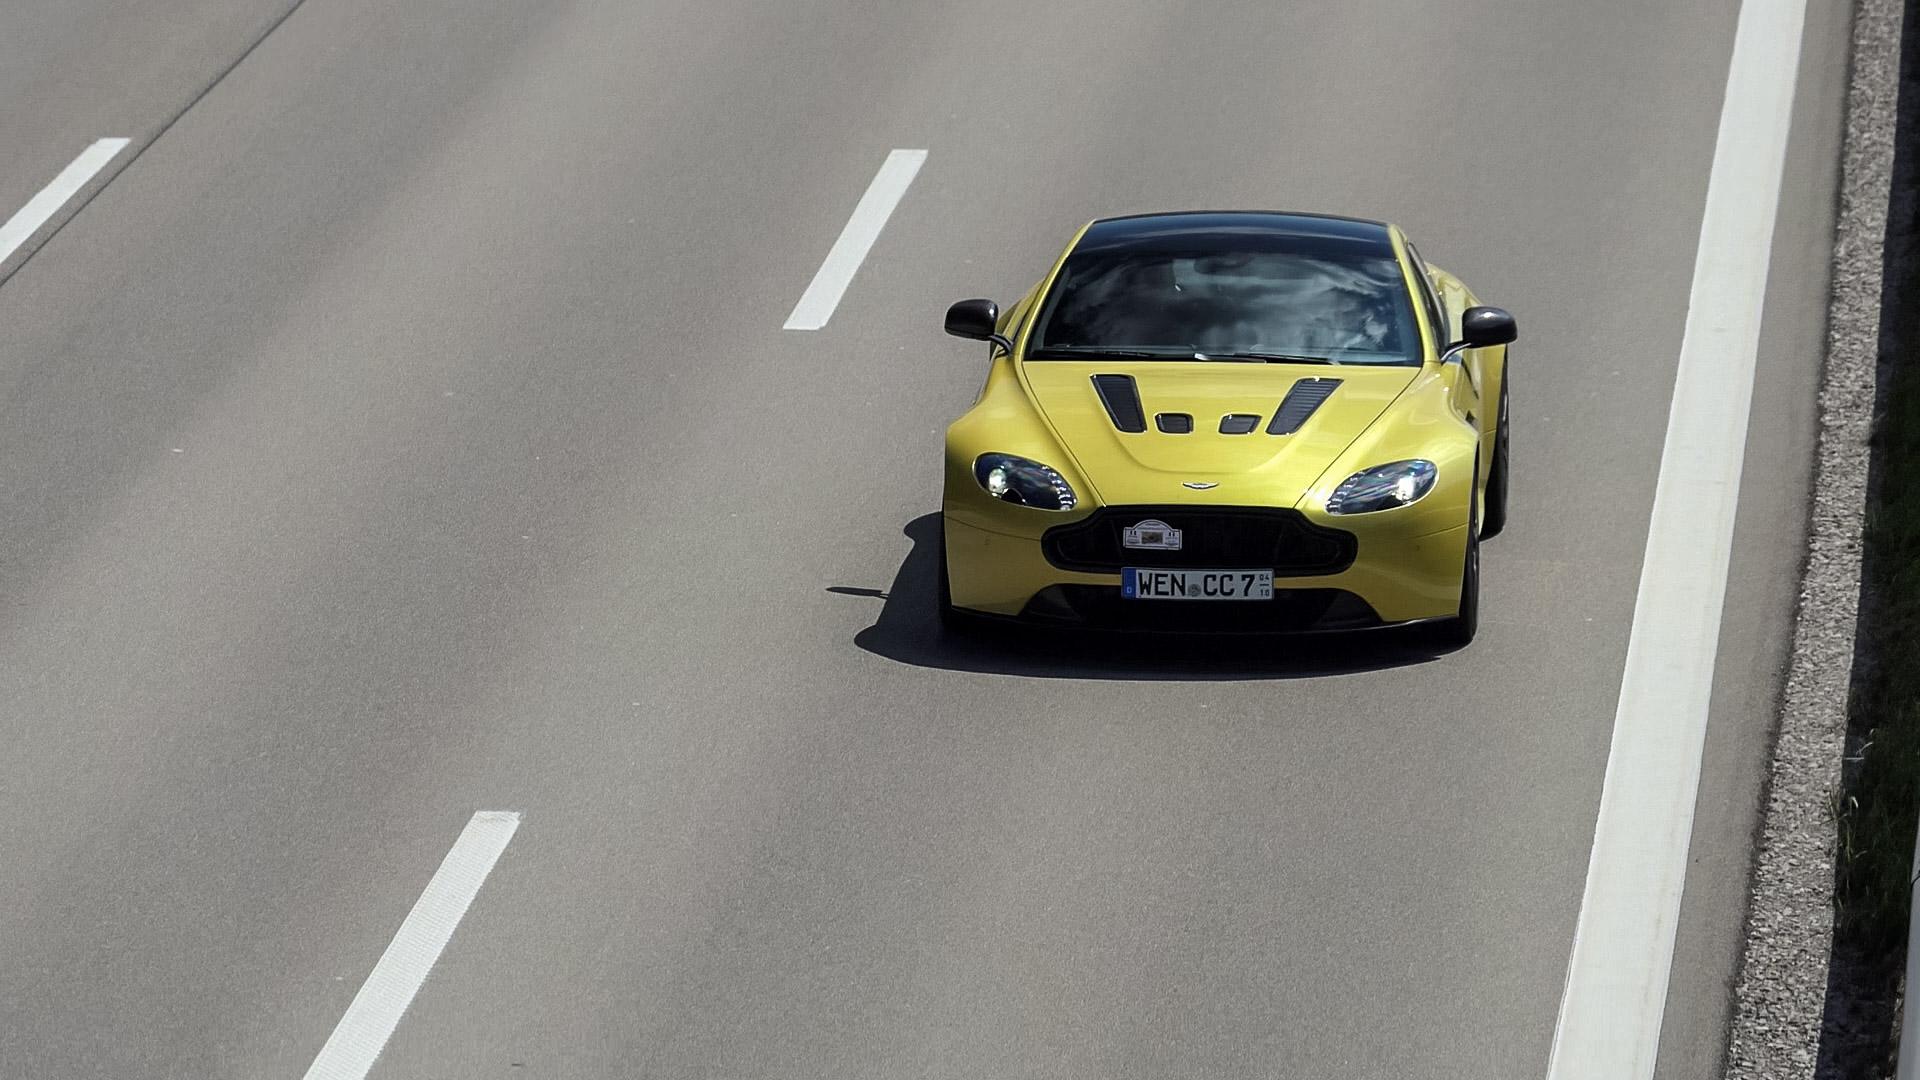 Aston Martin Vantage V12 - WEN-CC-7